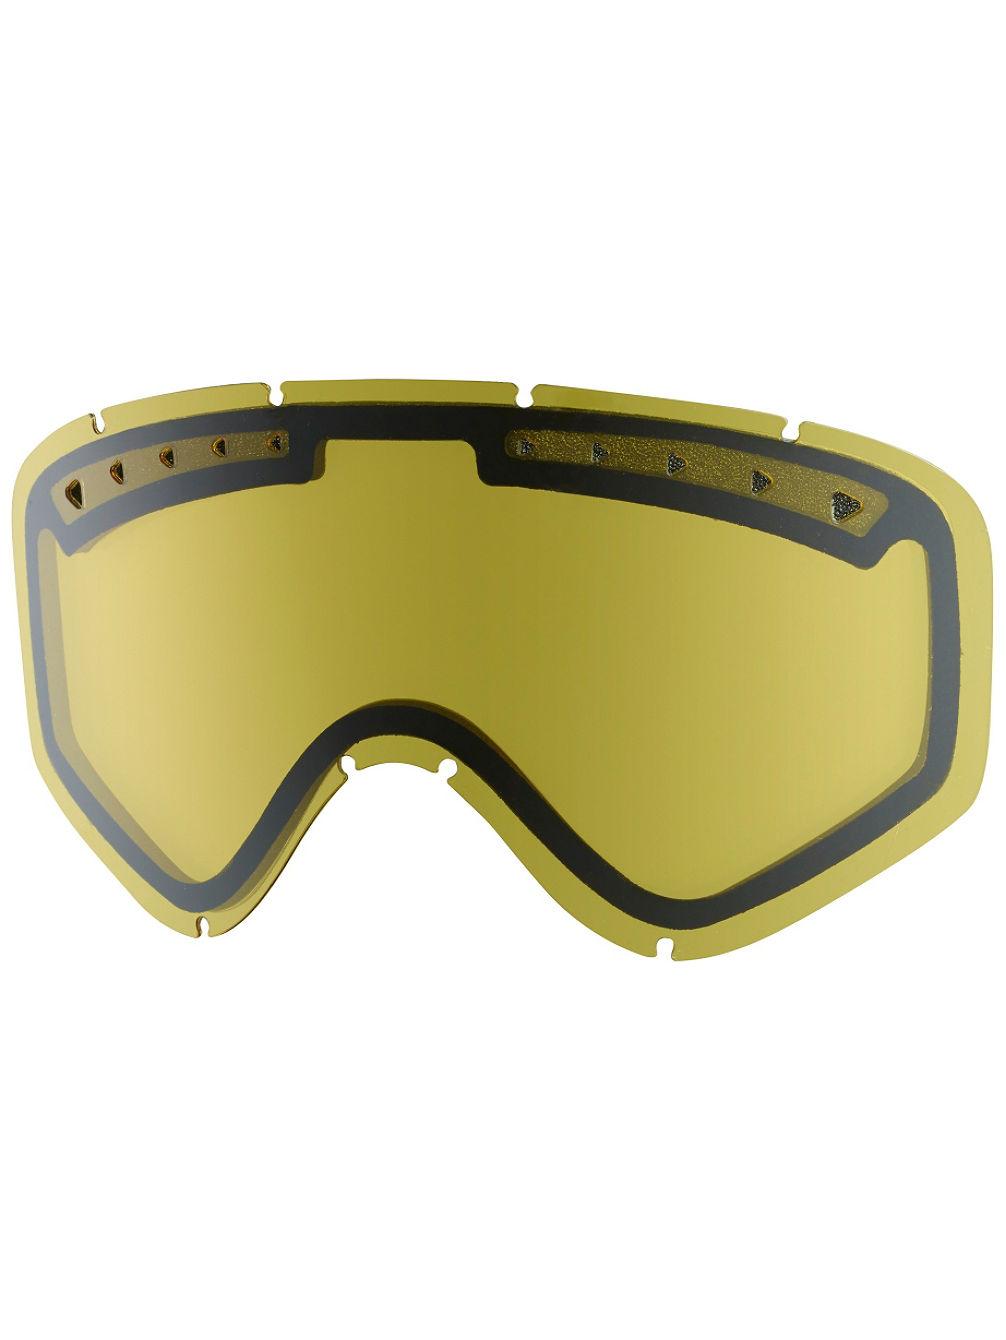 tracker-lens-yellow-boys